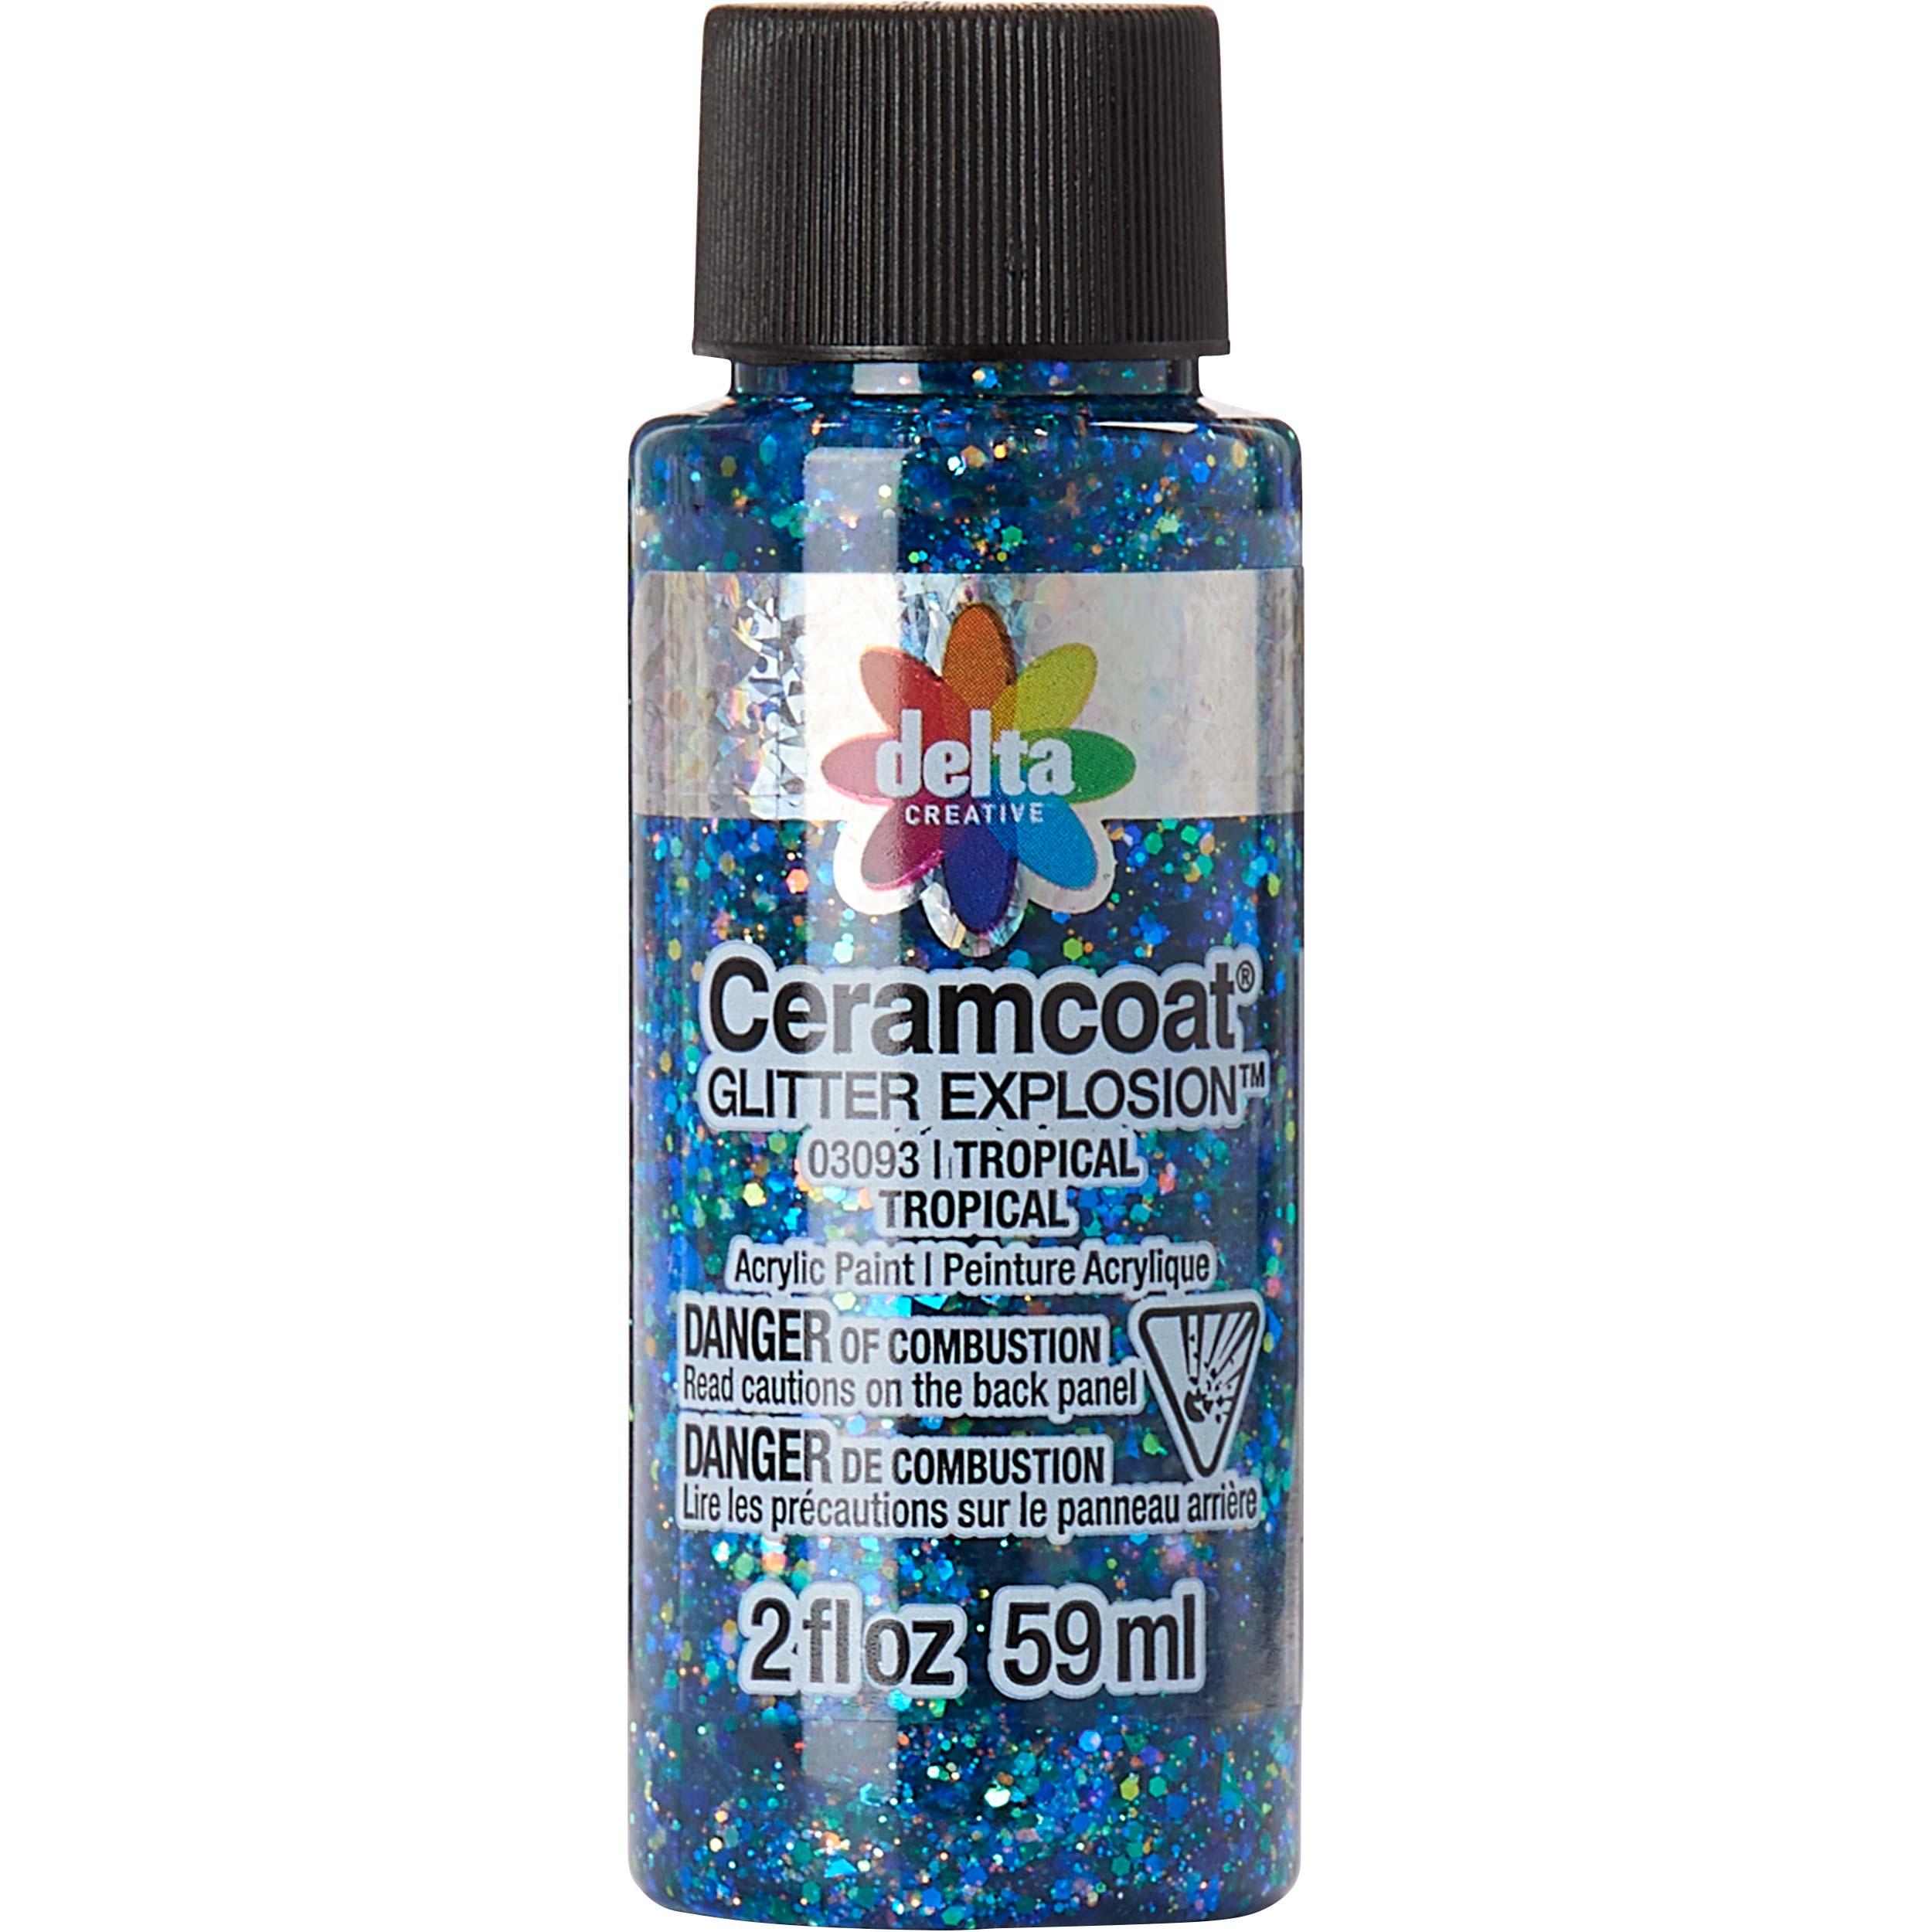 Delta Ceramcoat ® Glitter Explosion™ - Tropical, 2 oz. - 03093